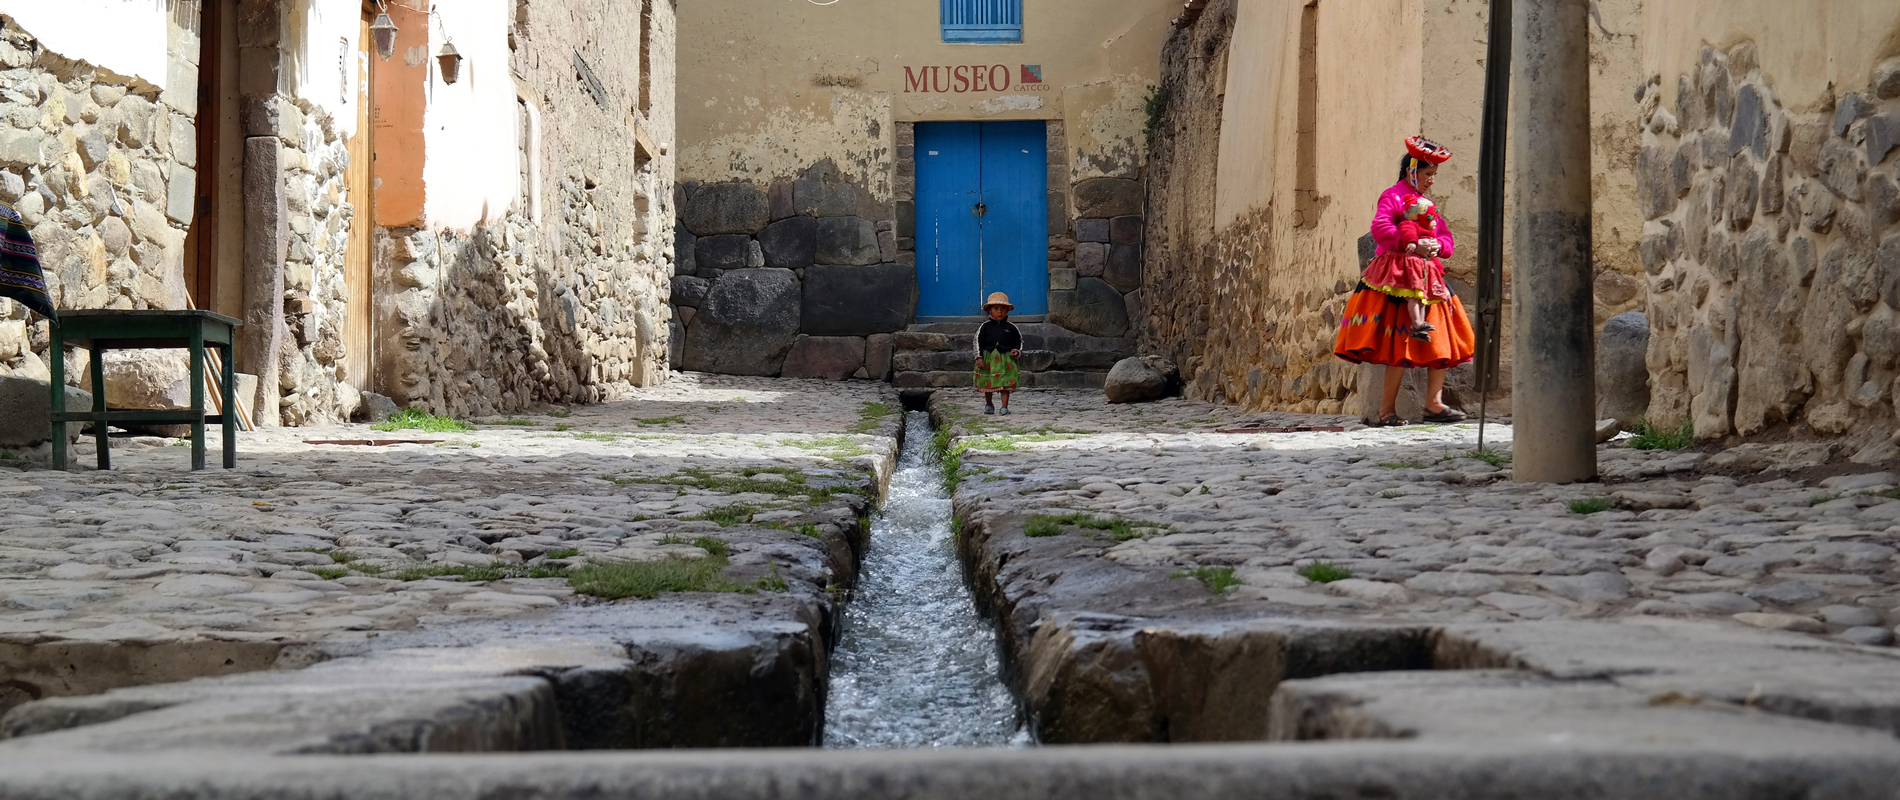 Pérou | Village d'Ollantaytambo